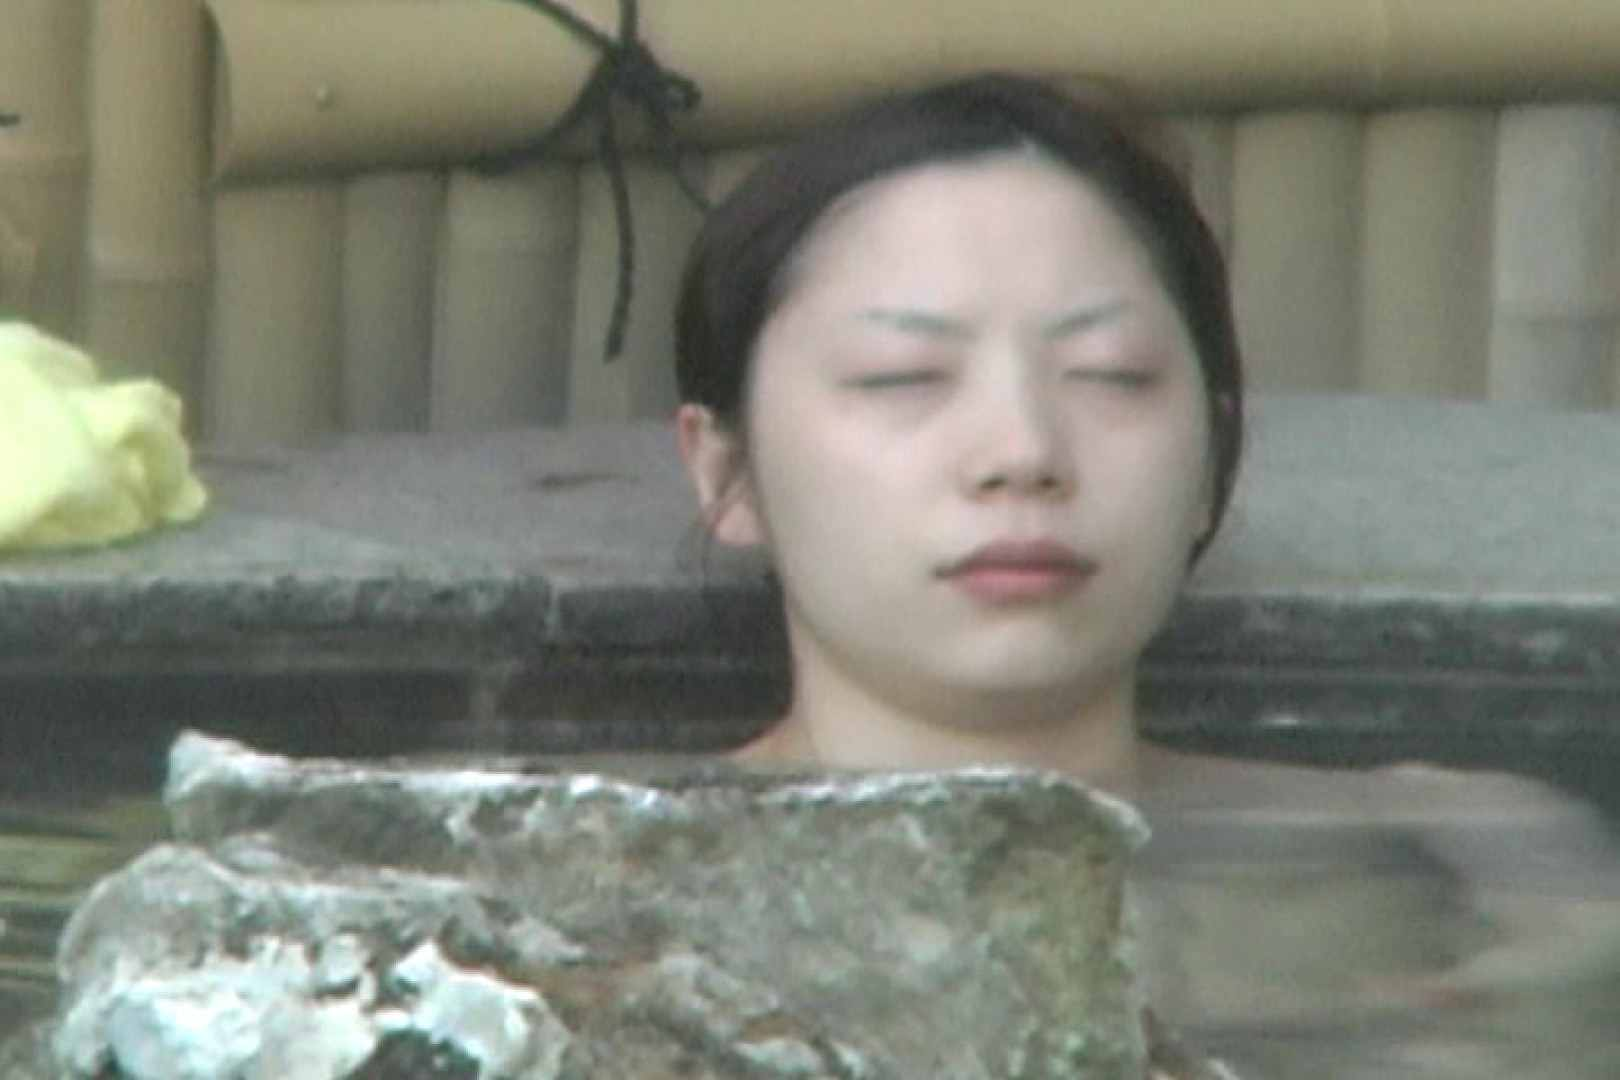 Aquaな露天風呂Vol.596 OLセックス | 盗撮  77画像 46